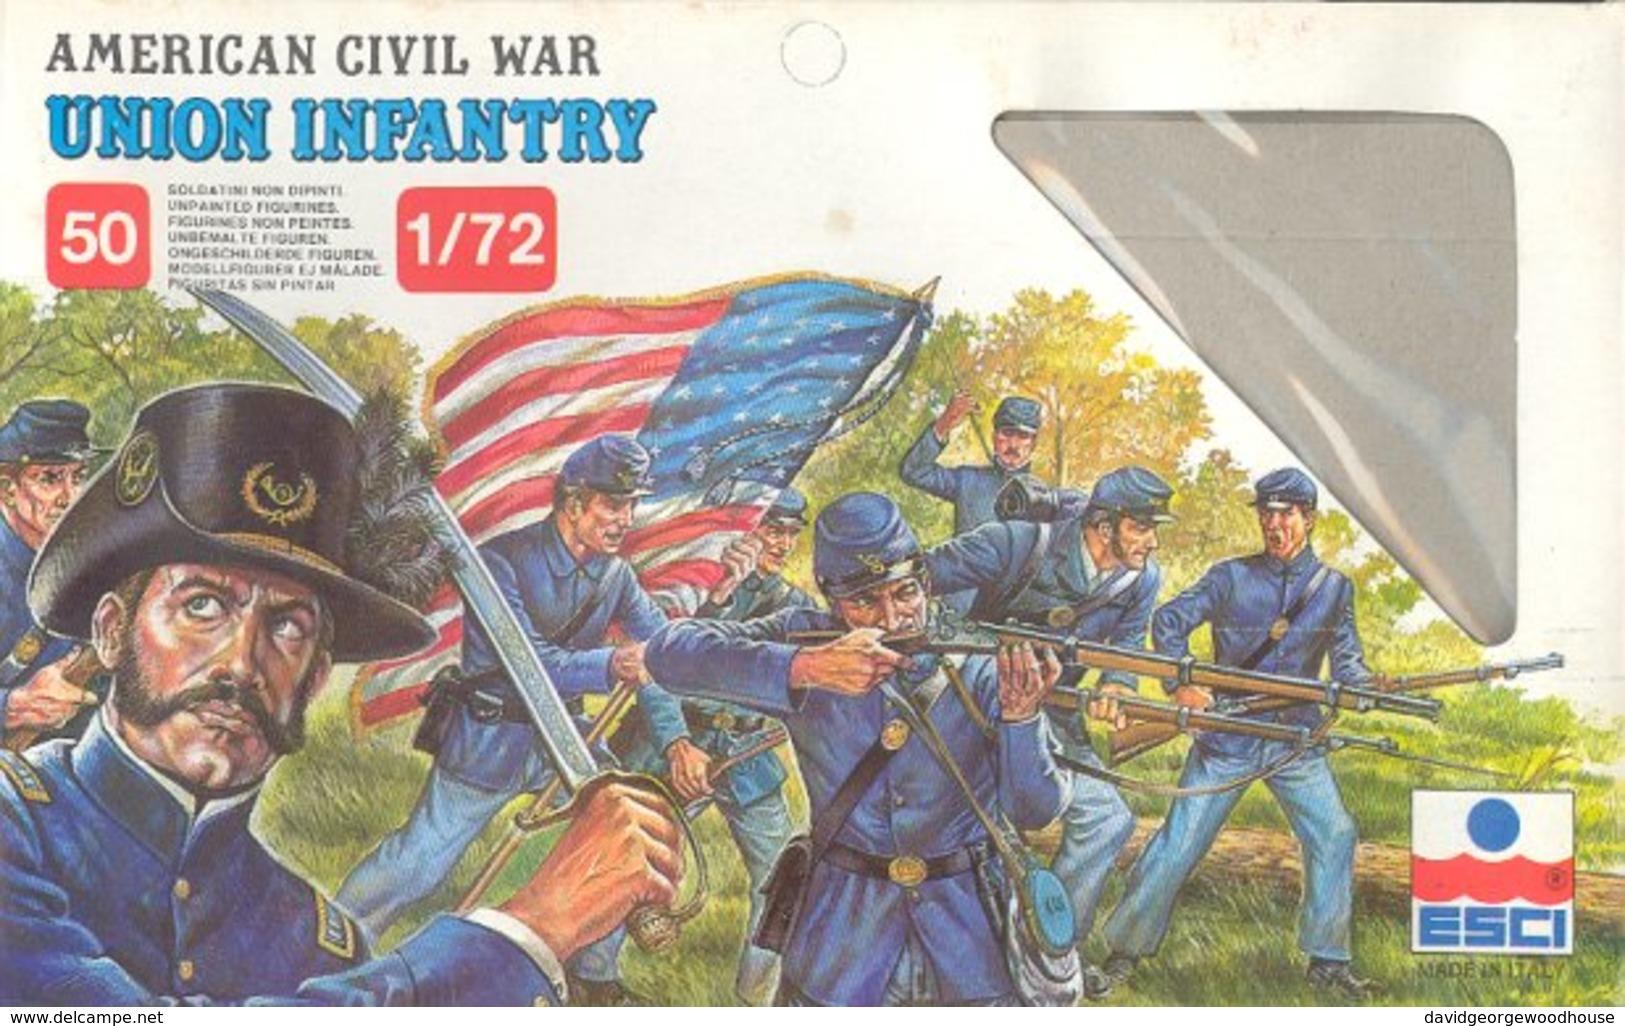 ESCI 222 American Civil War Union Infantry. - Small Figures